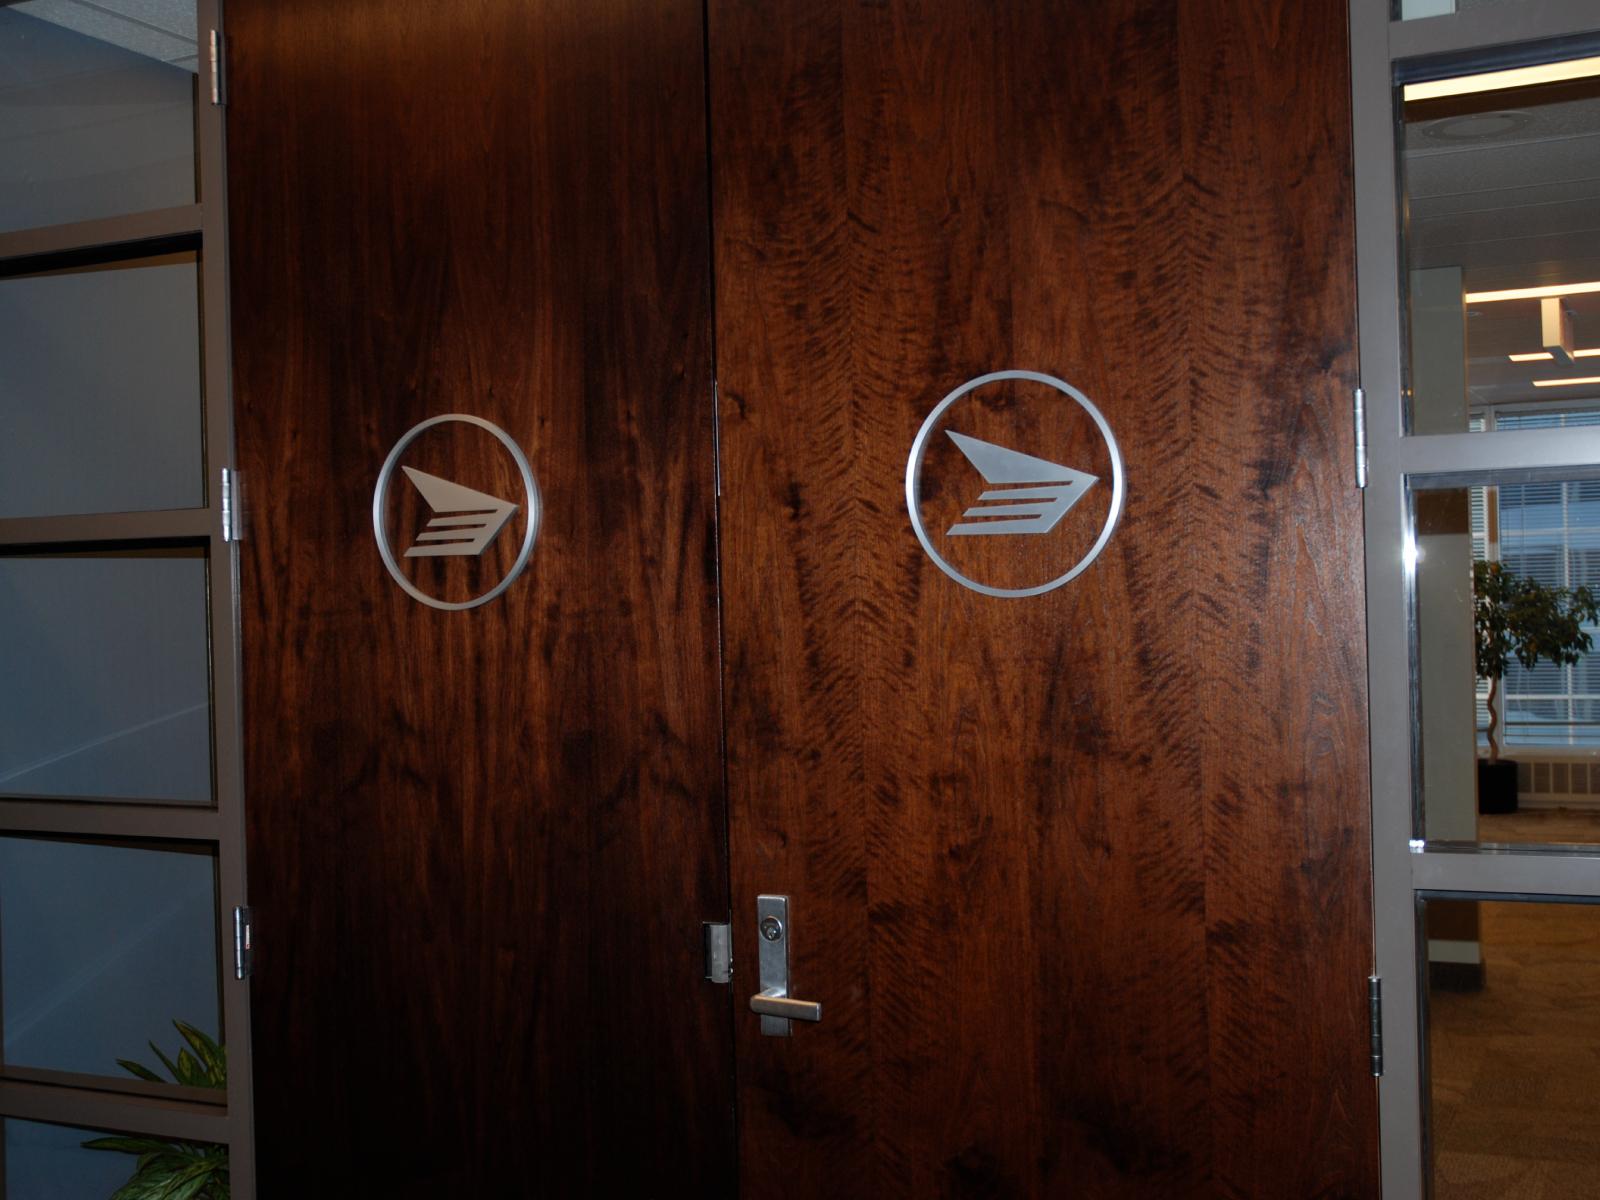 Canada_Post_Door_Signage-1600x1200